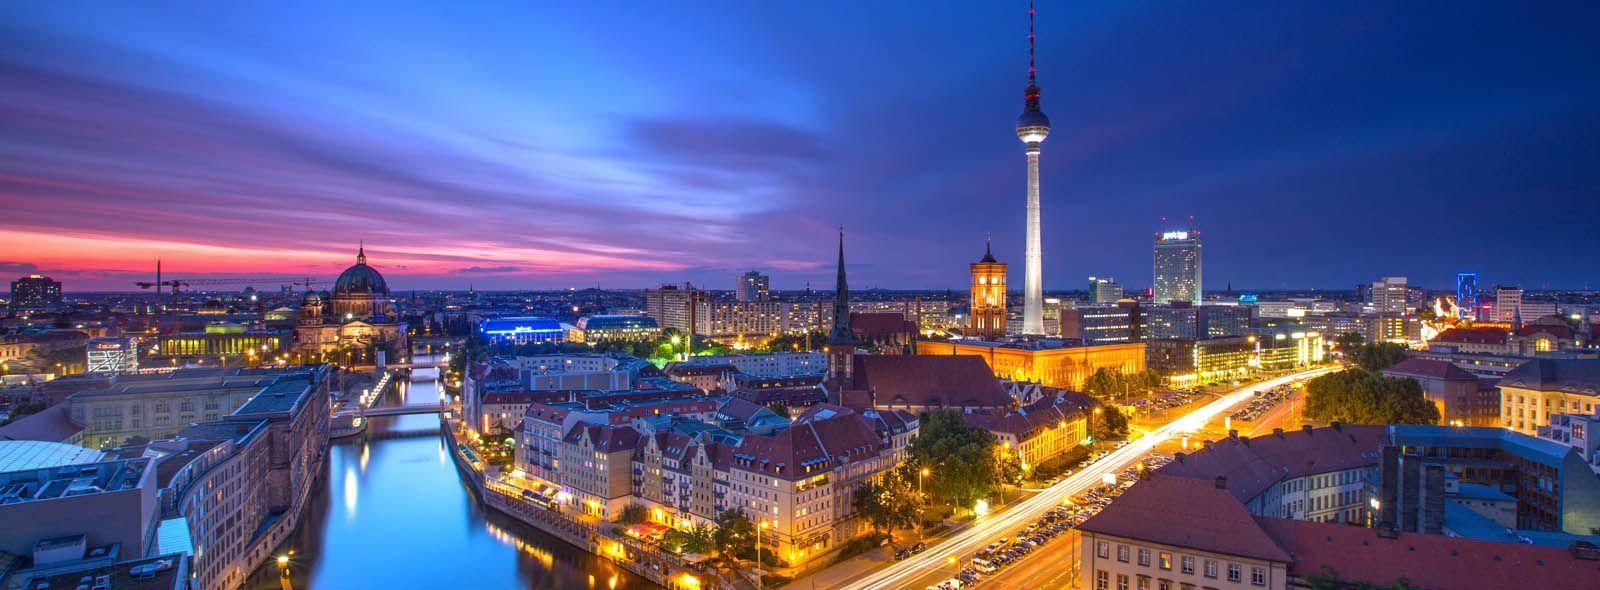 Berlino luoghi di interesse